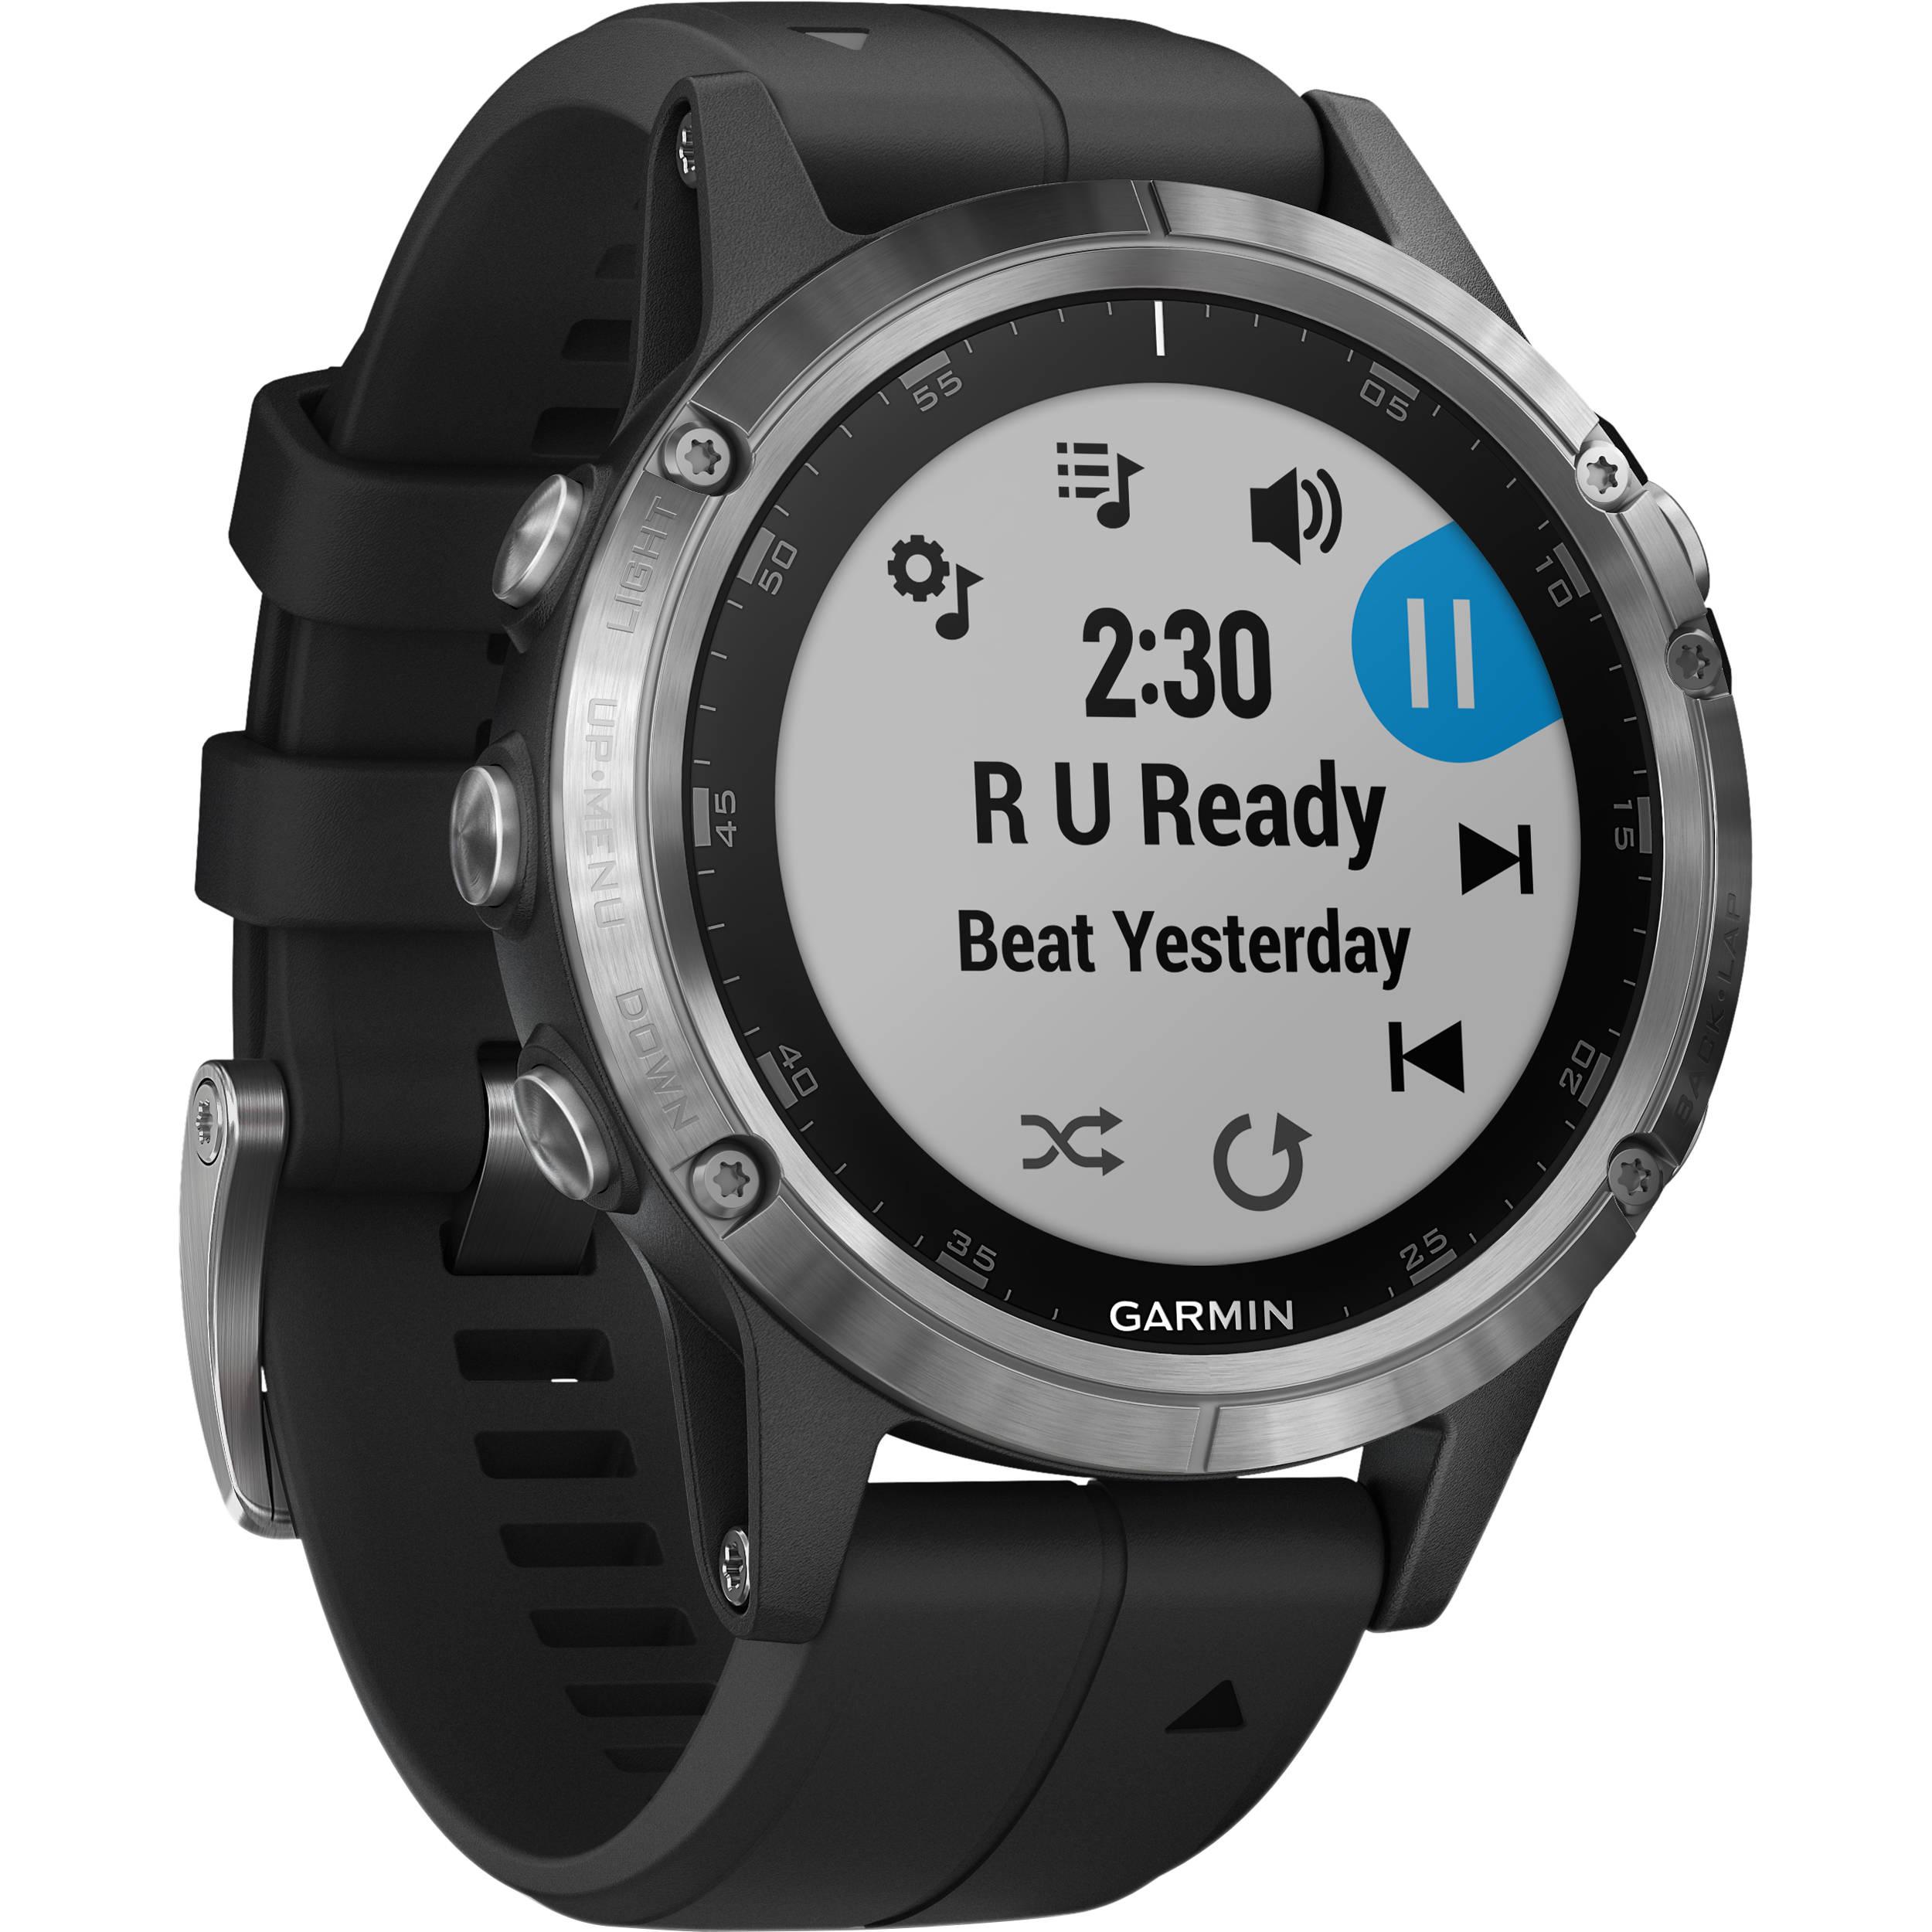 Garmin fenix 5 Plus Multi-Sport Training GPS Watch 010-01988-10